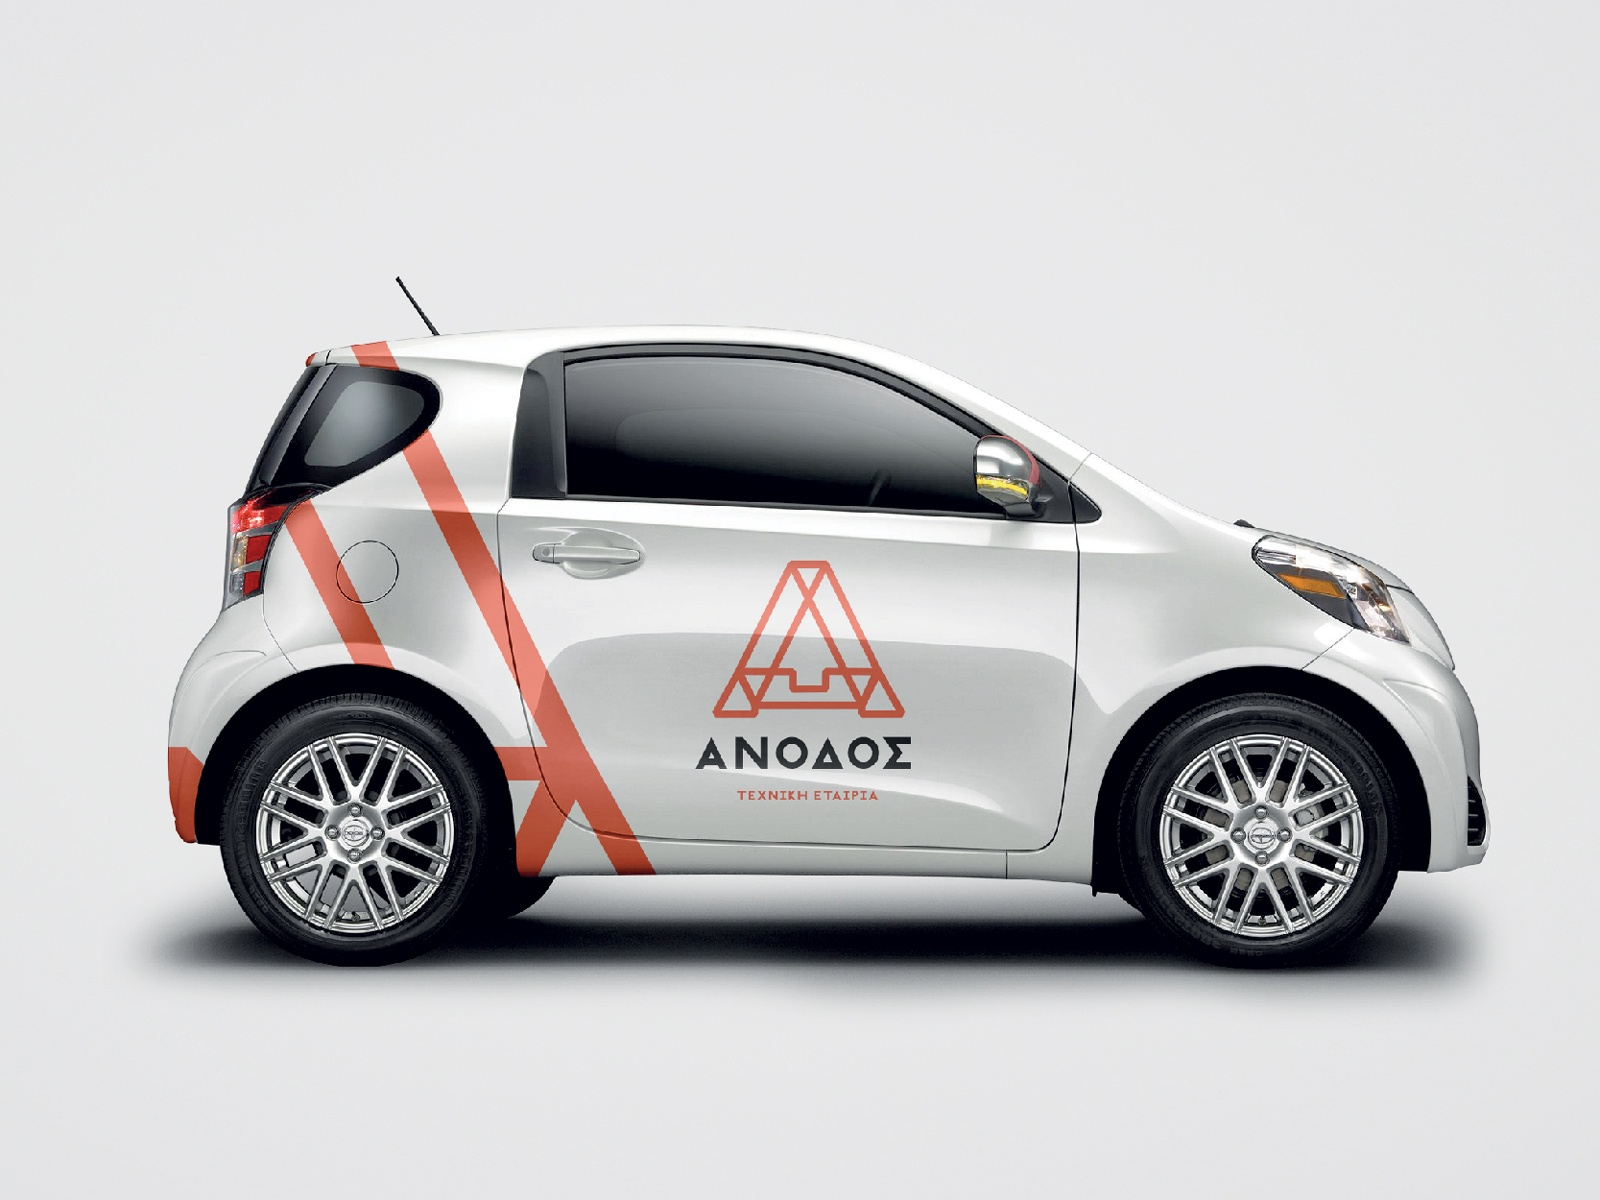 Anodos_Presentation-1_2-06